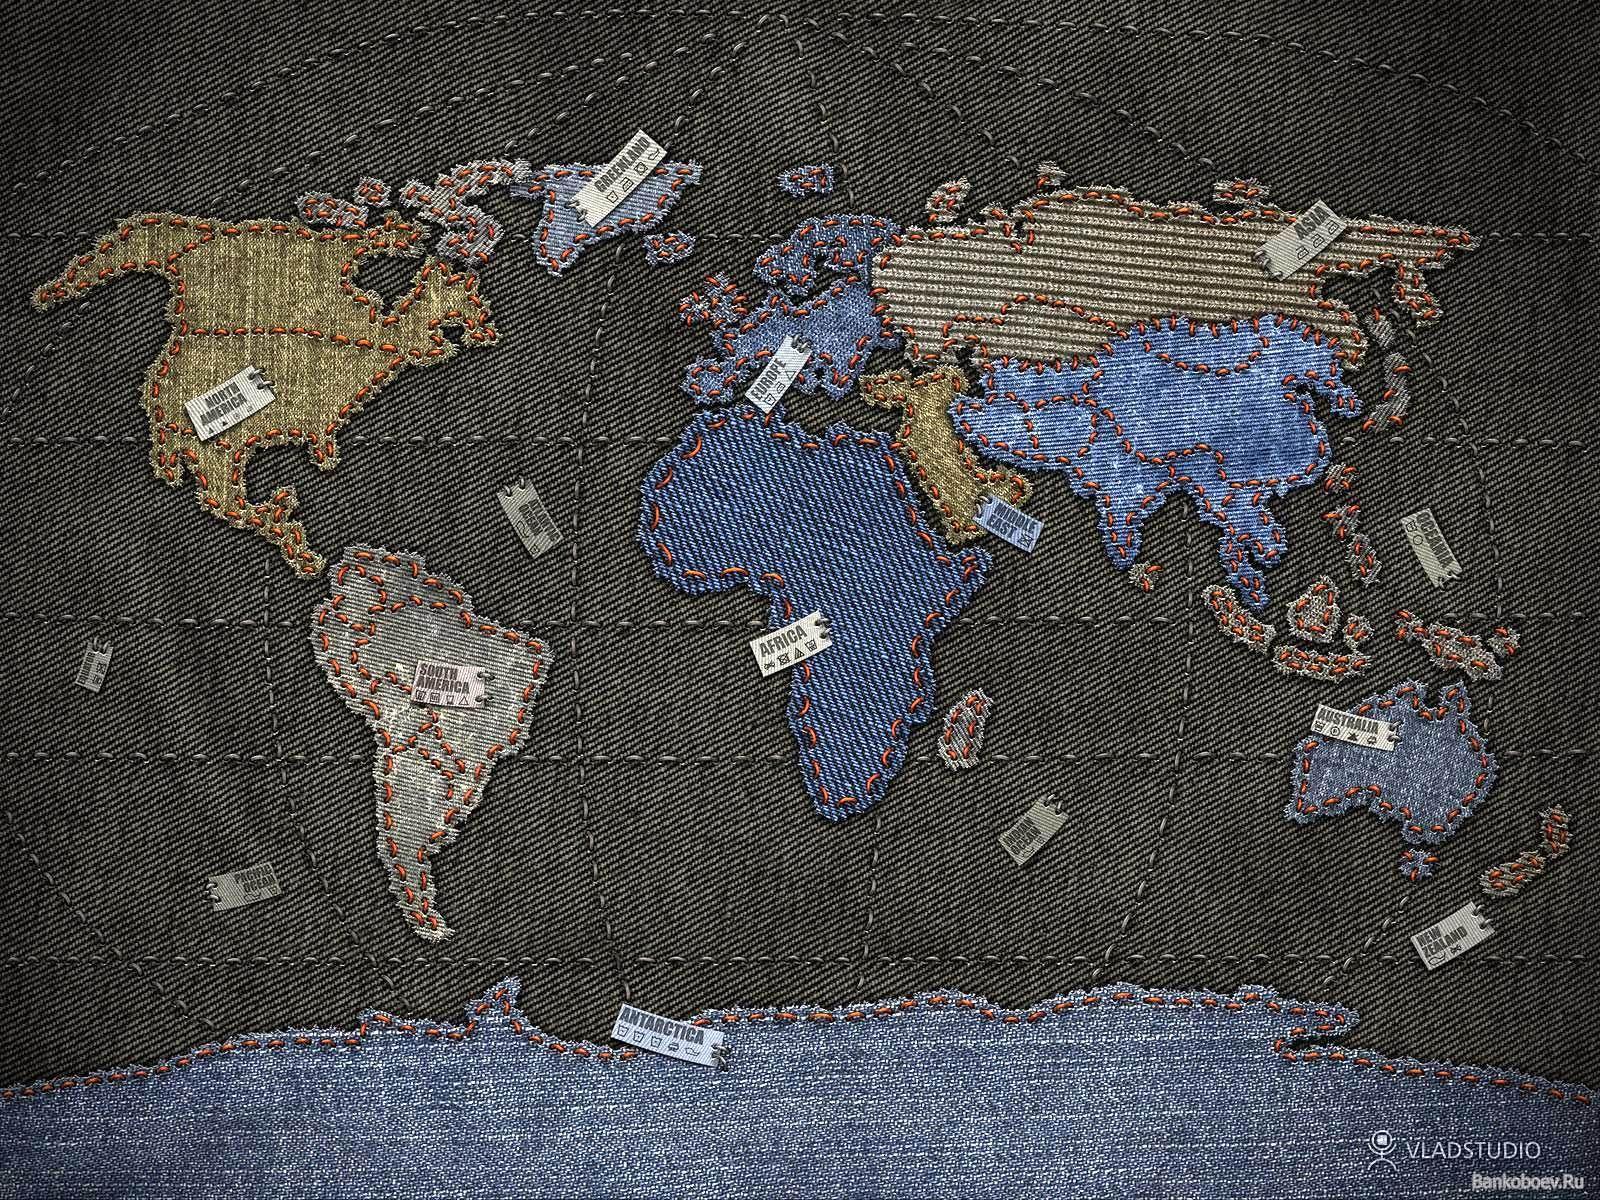 Hq wallpaper jeans world map 2560 x 1600 on the desktop high quality hq wallpaper jeans world map 2560 x 1600 on the desktop high quality gumiabroncs Choice Image